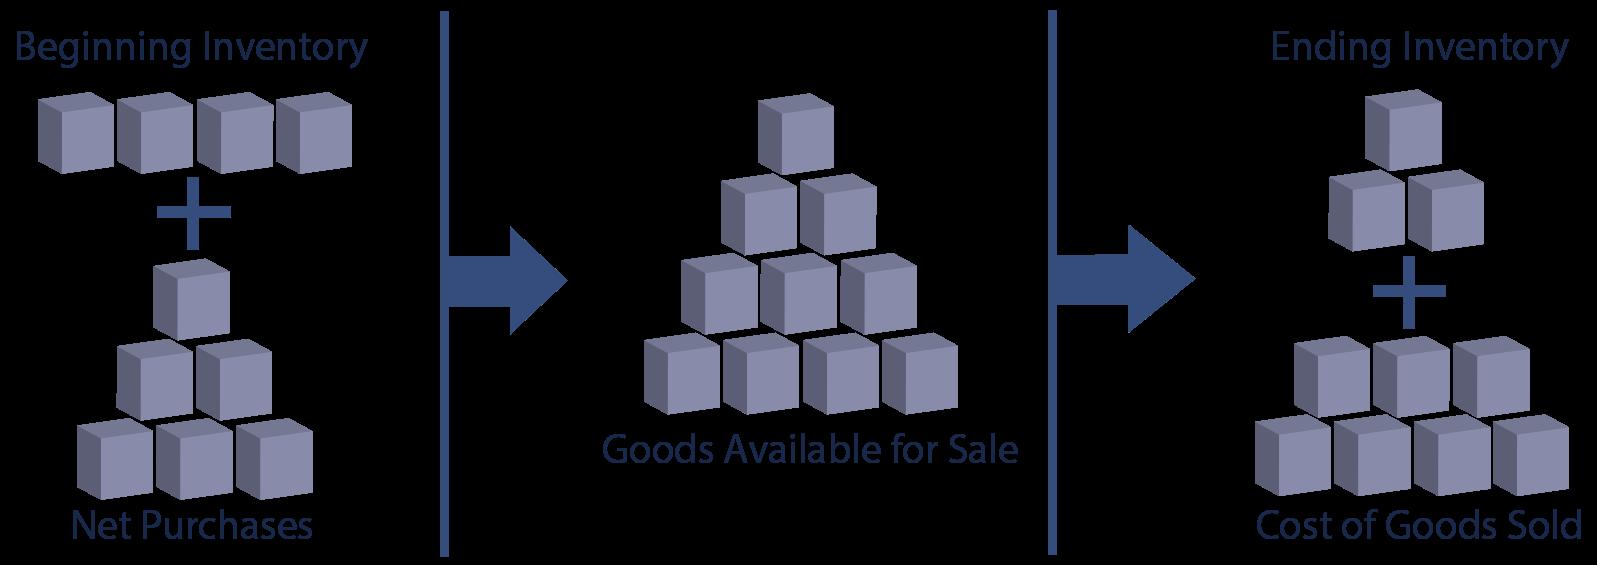 Inventory Measurement illustration